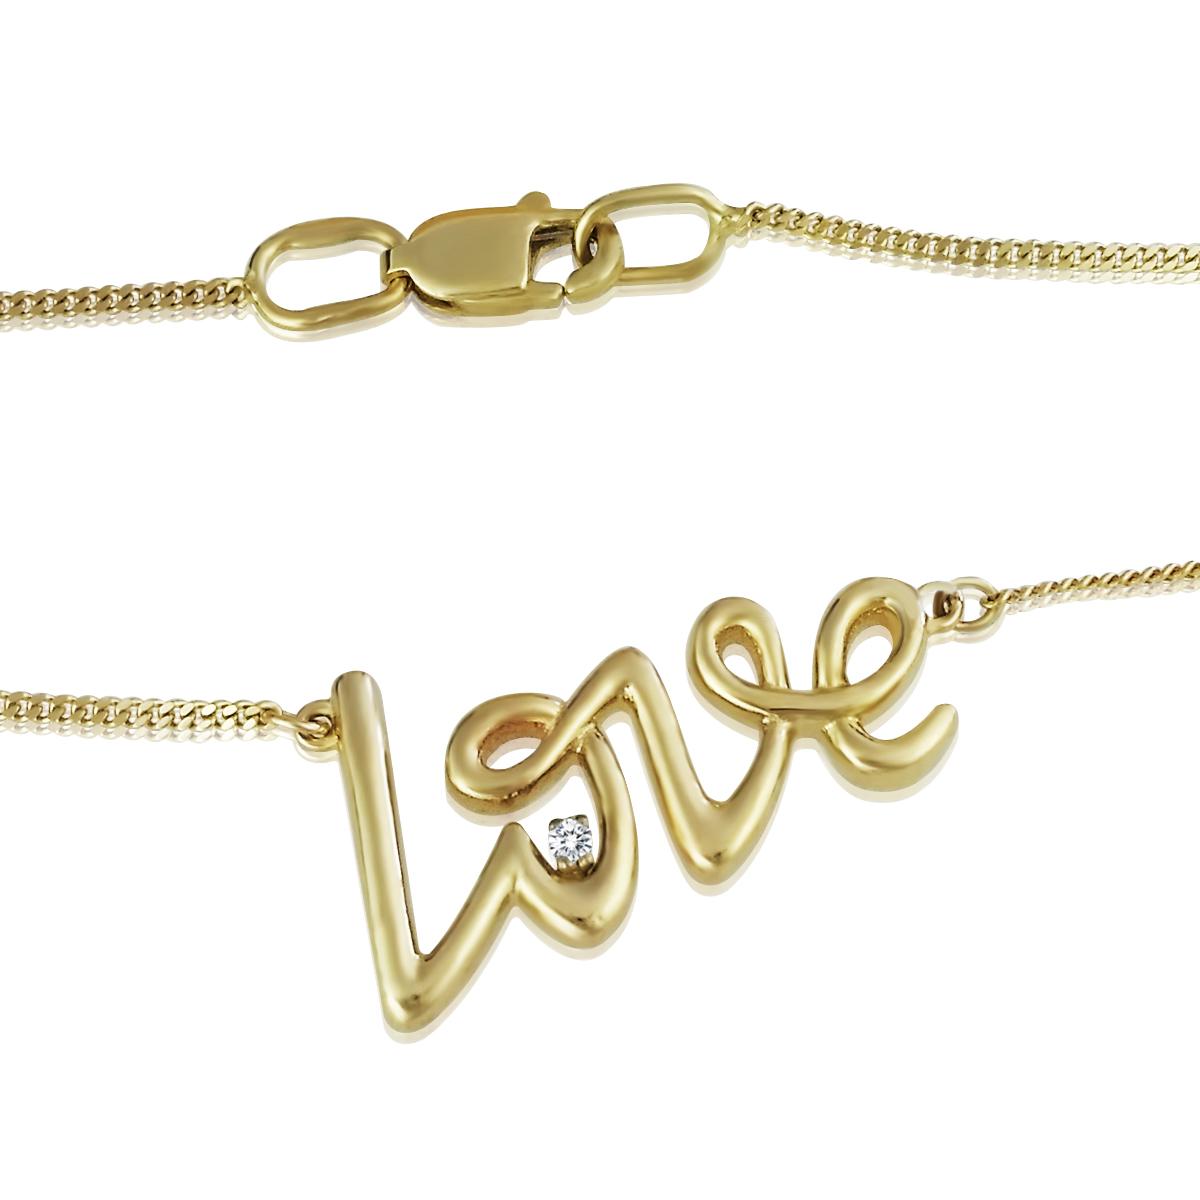 Золотой кулон колье «Love» на цепочке с бриллиантом